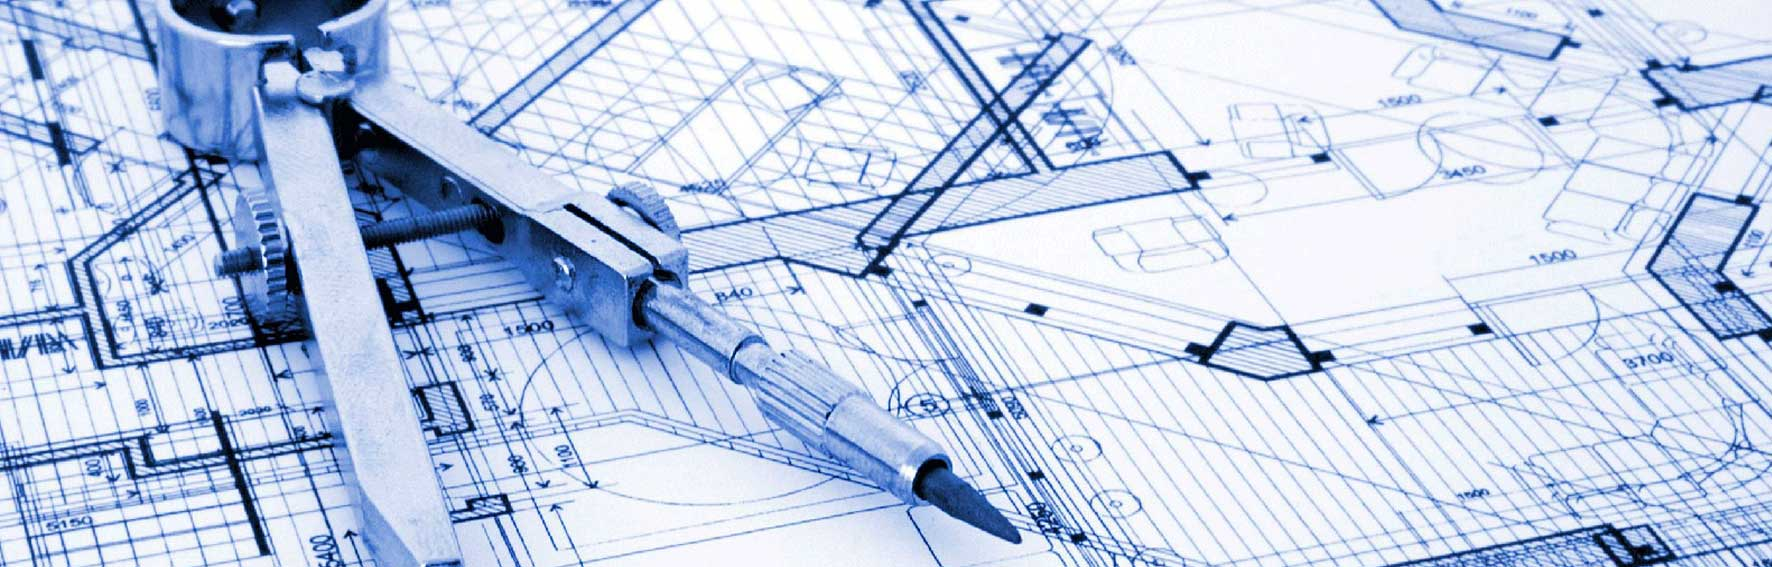 Laurea In Ingegneria Civile Magistrale: Materie e Sbocchi Professionali